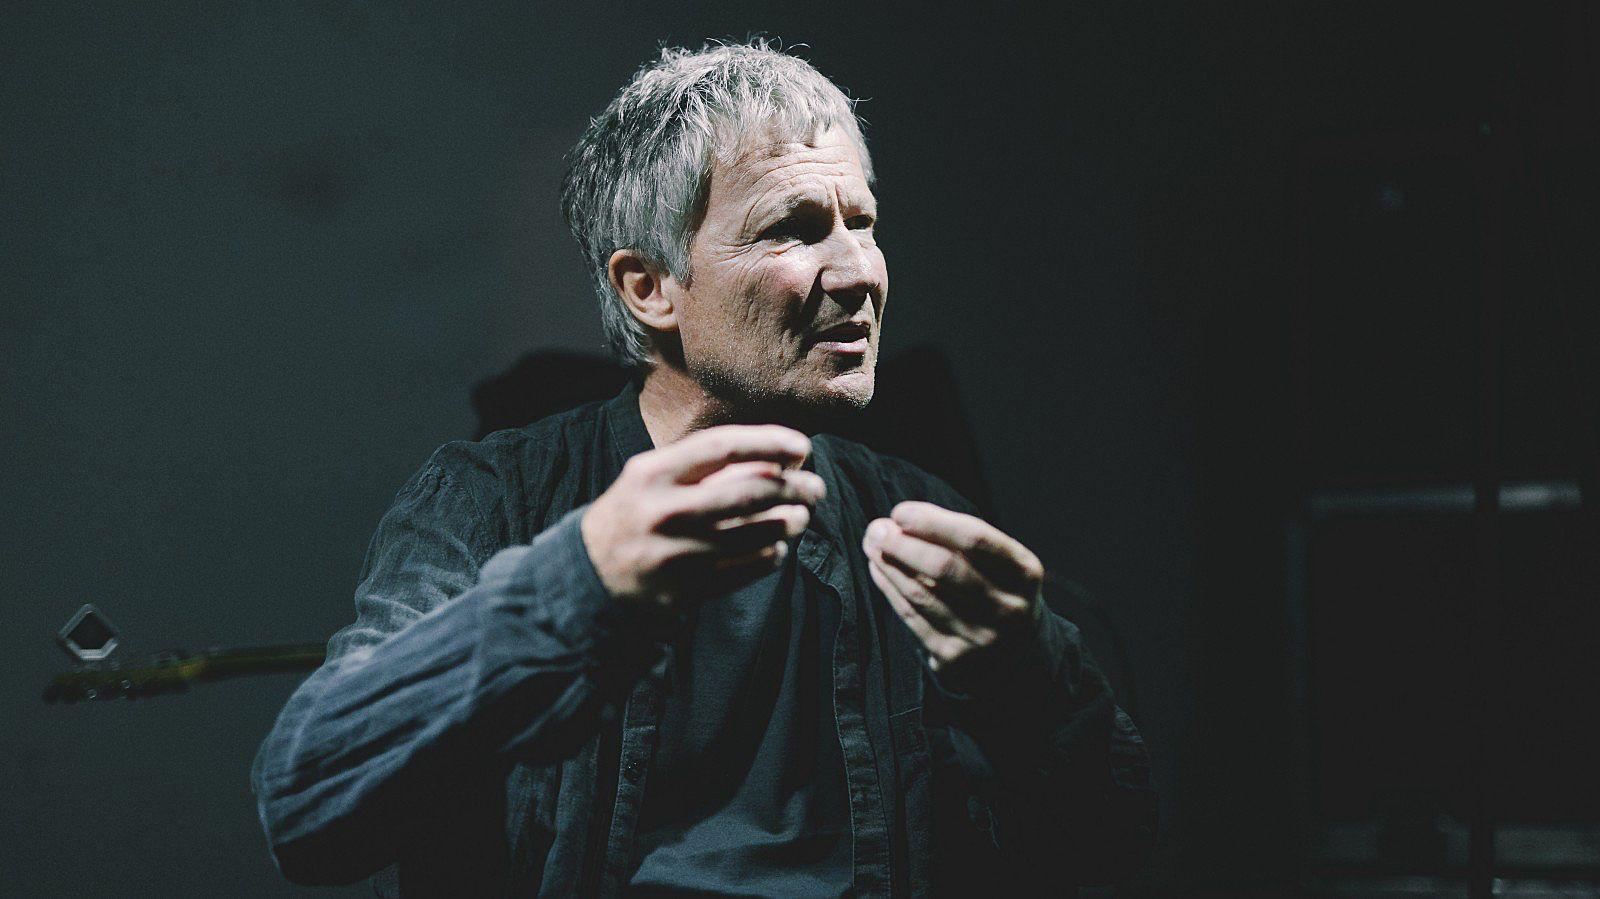 Михаэль Ротер во время ИМИ.Семинара в Powerhouse Moscow 28 августа 2019 года. Фото: Марк Серый